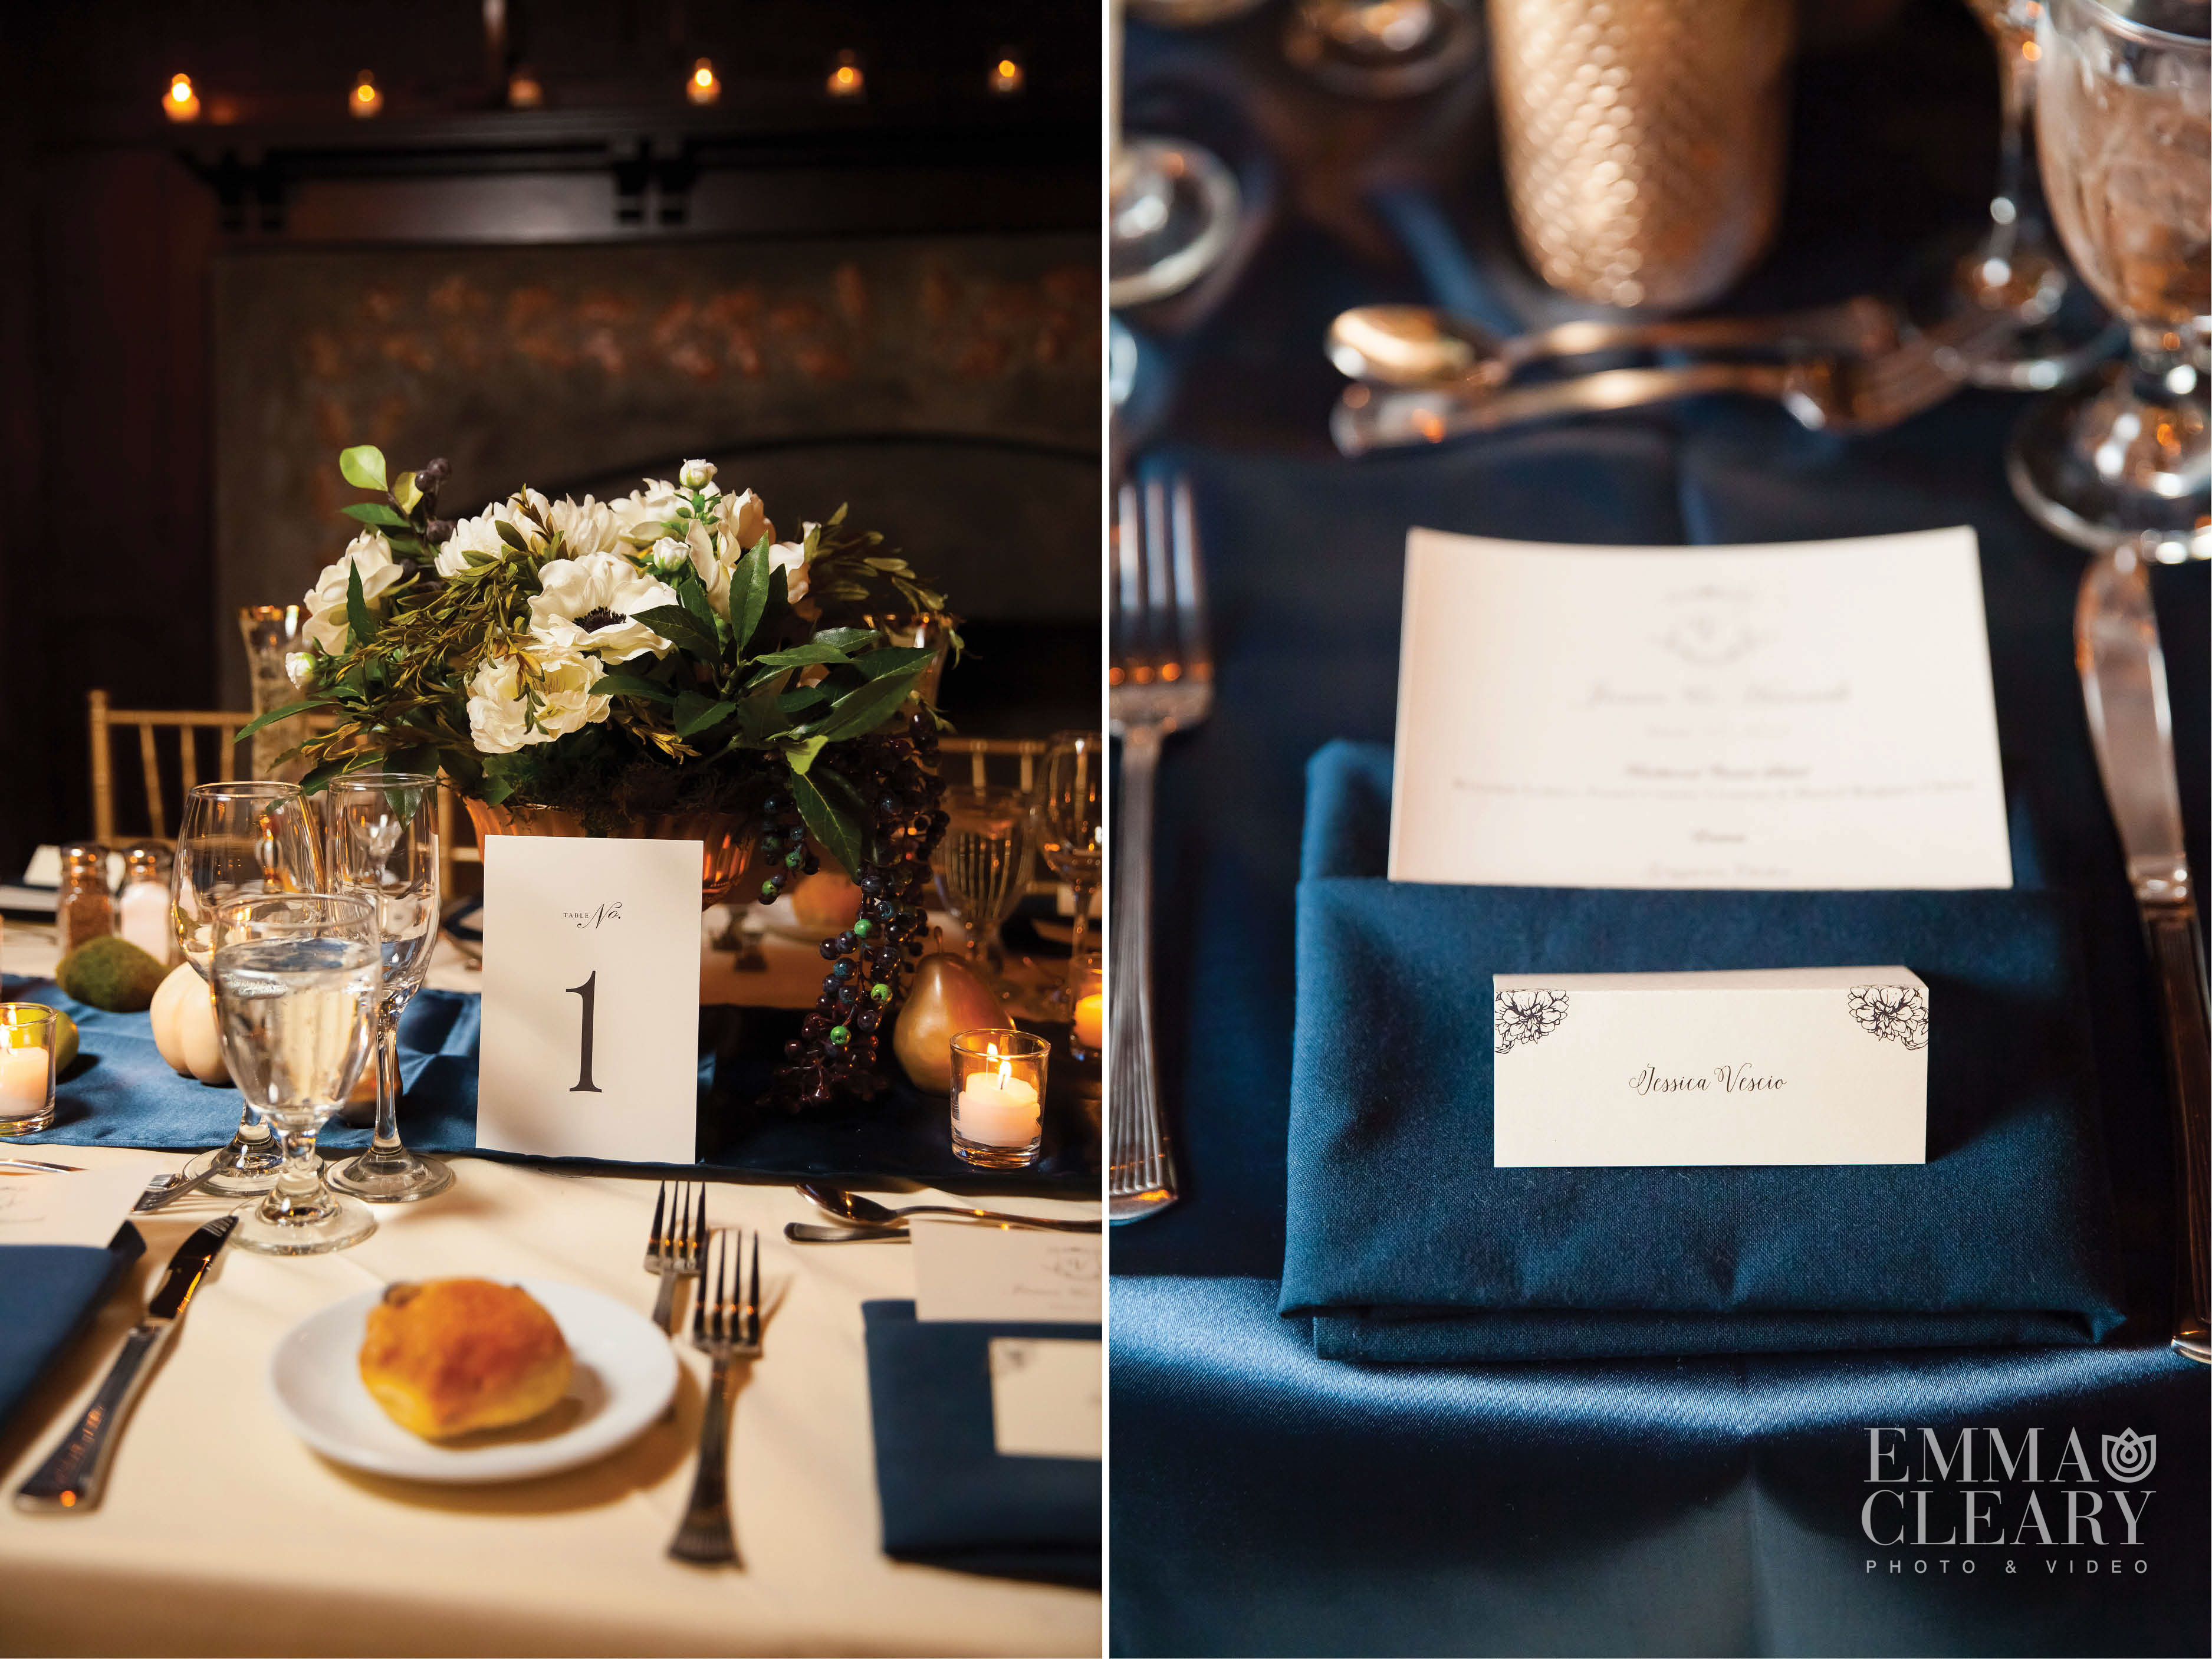 emma_cleary_photography-hotel-du-village-wedding18